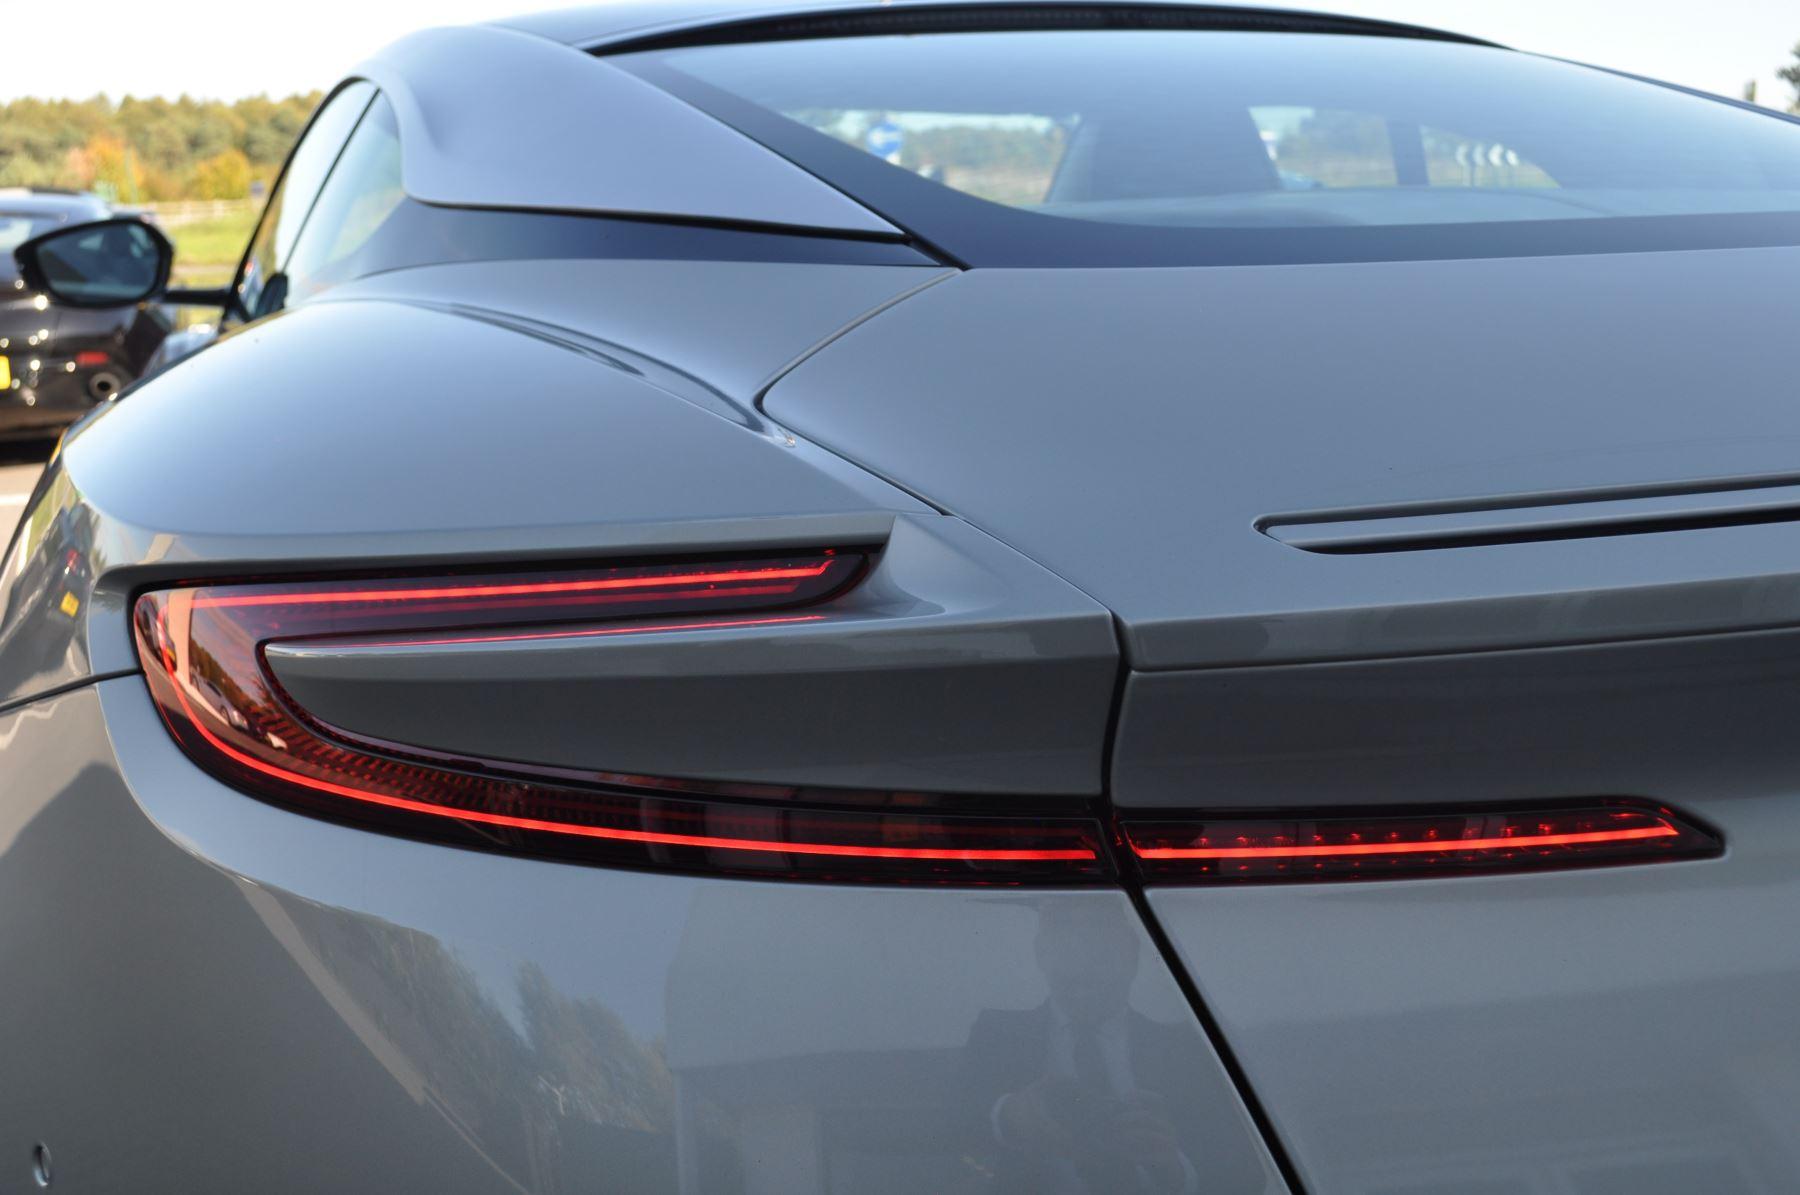 Aston Martin DB11 V12 2dr Touchtronic image 15